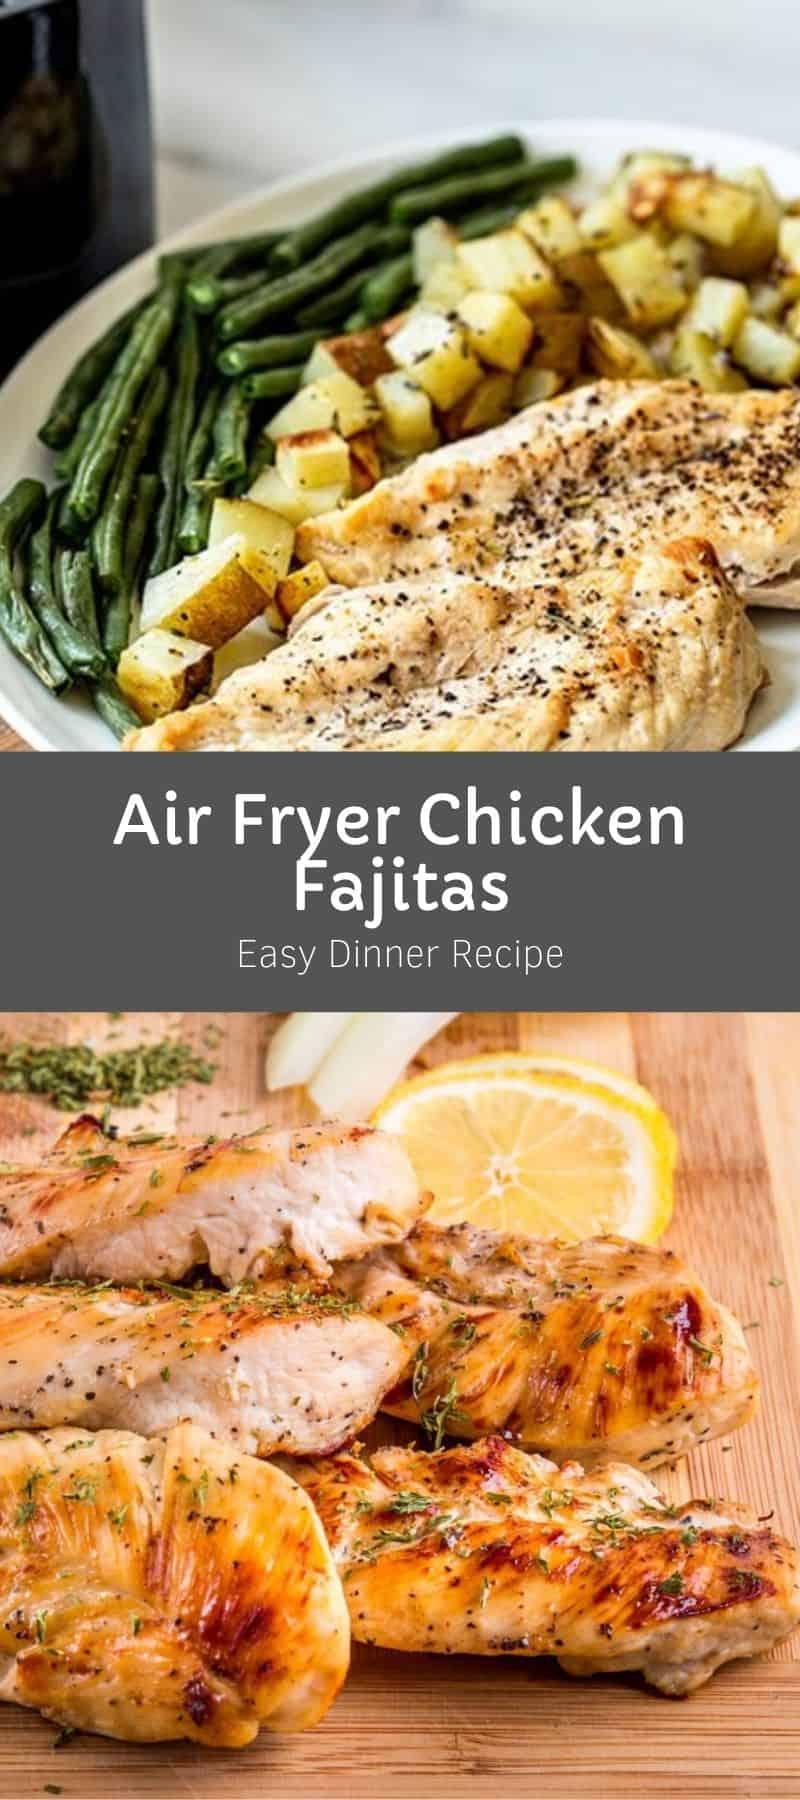 Air Fryer Chicken Fajitas Dinner Recipe 3